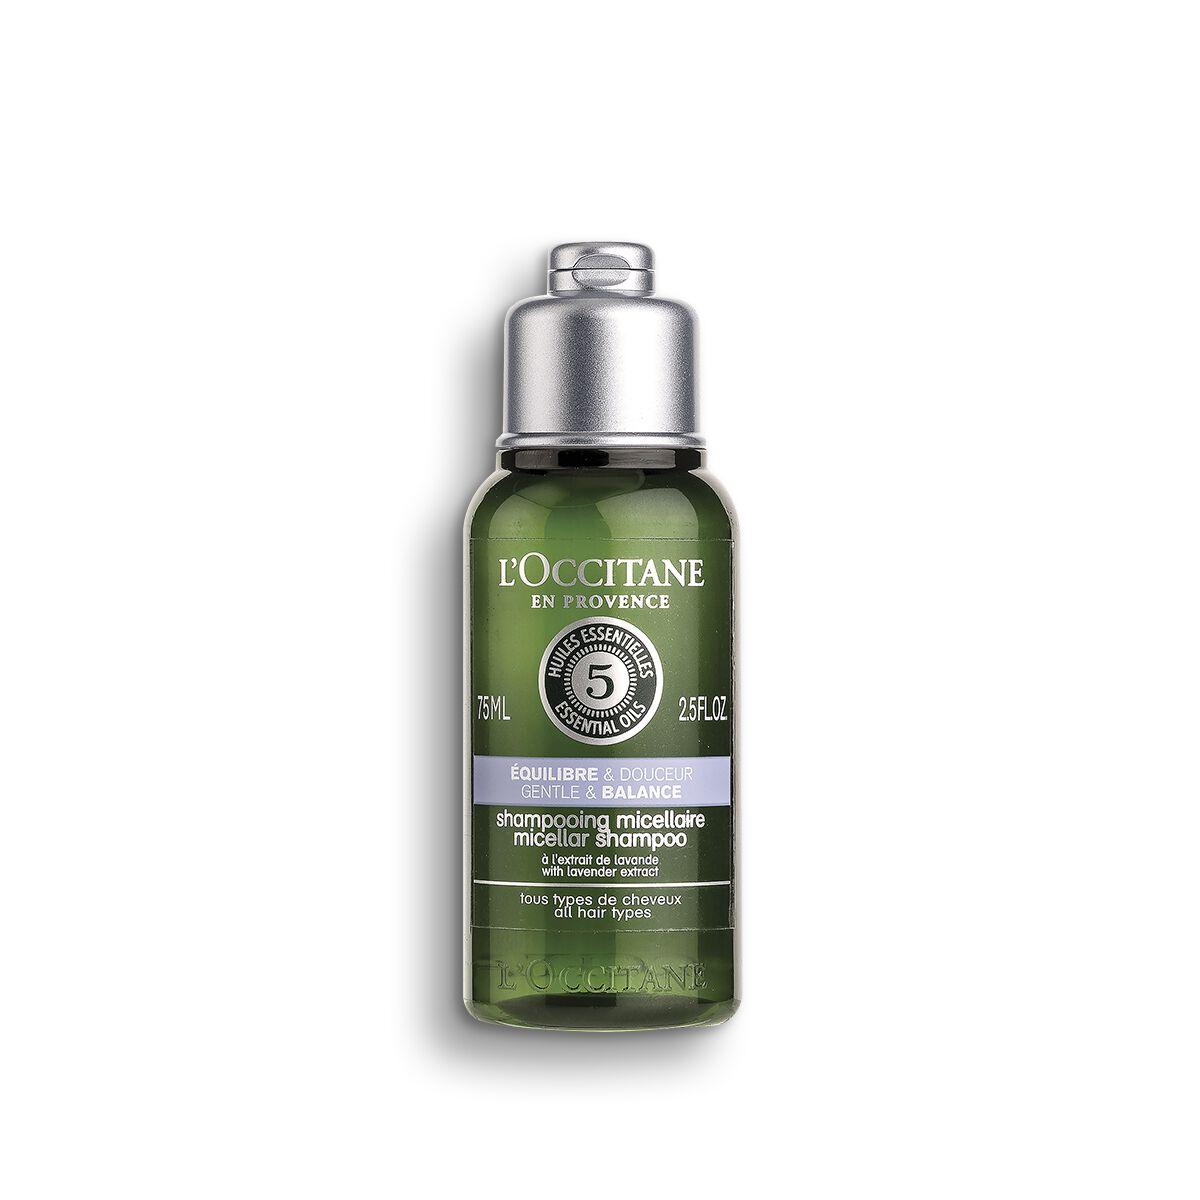 Aromachologie Gentle & Balance Micellar Shampoo 75 ml.